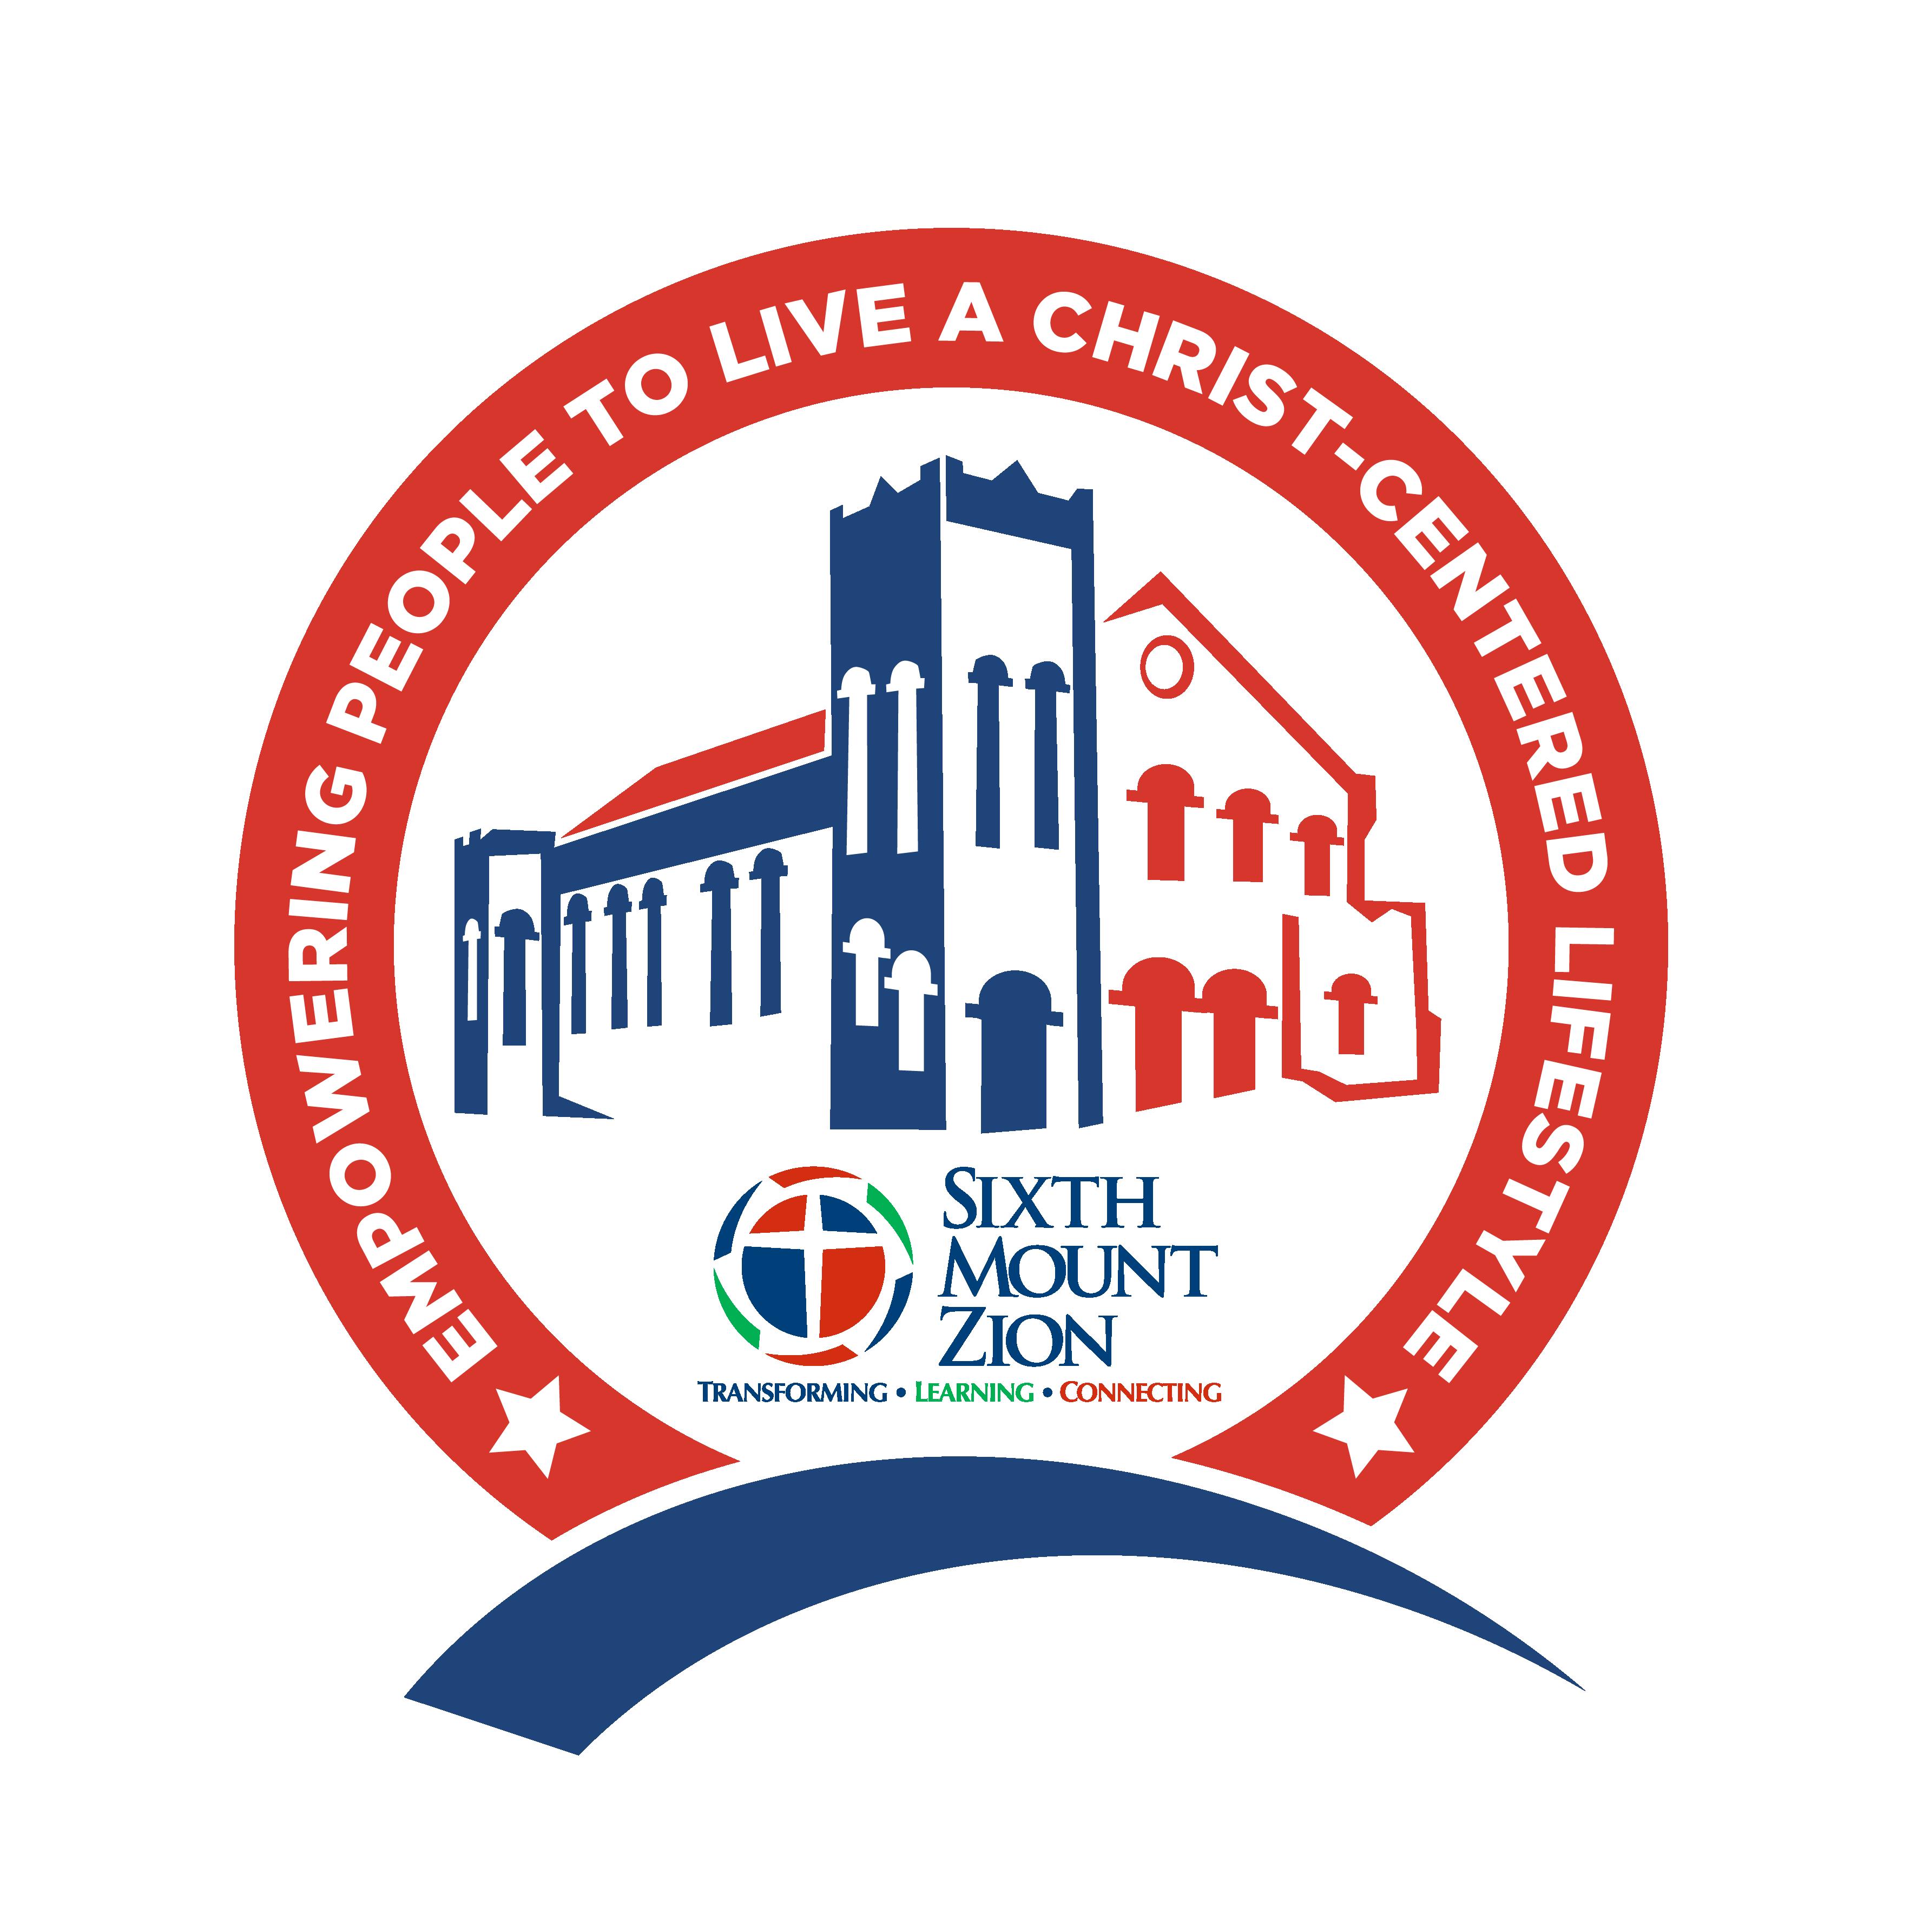 Sixth Mount Zion Baptist Church